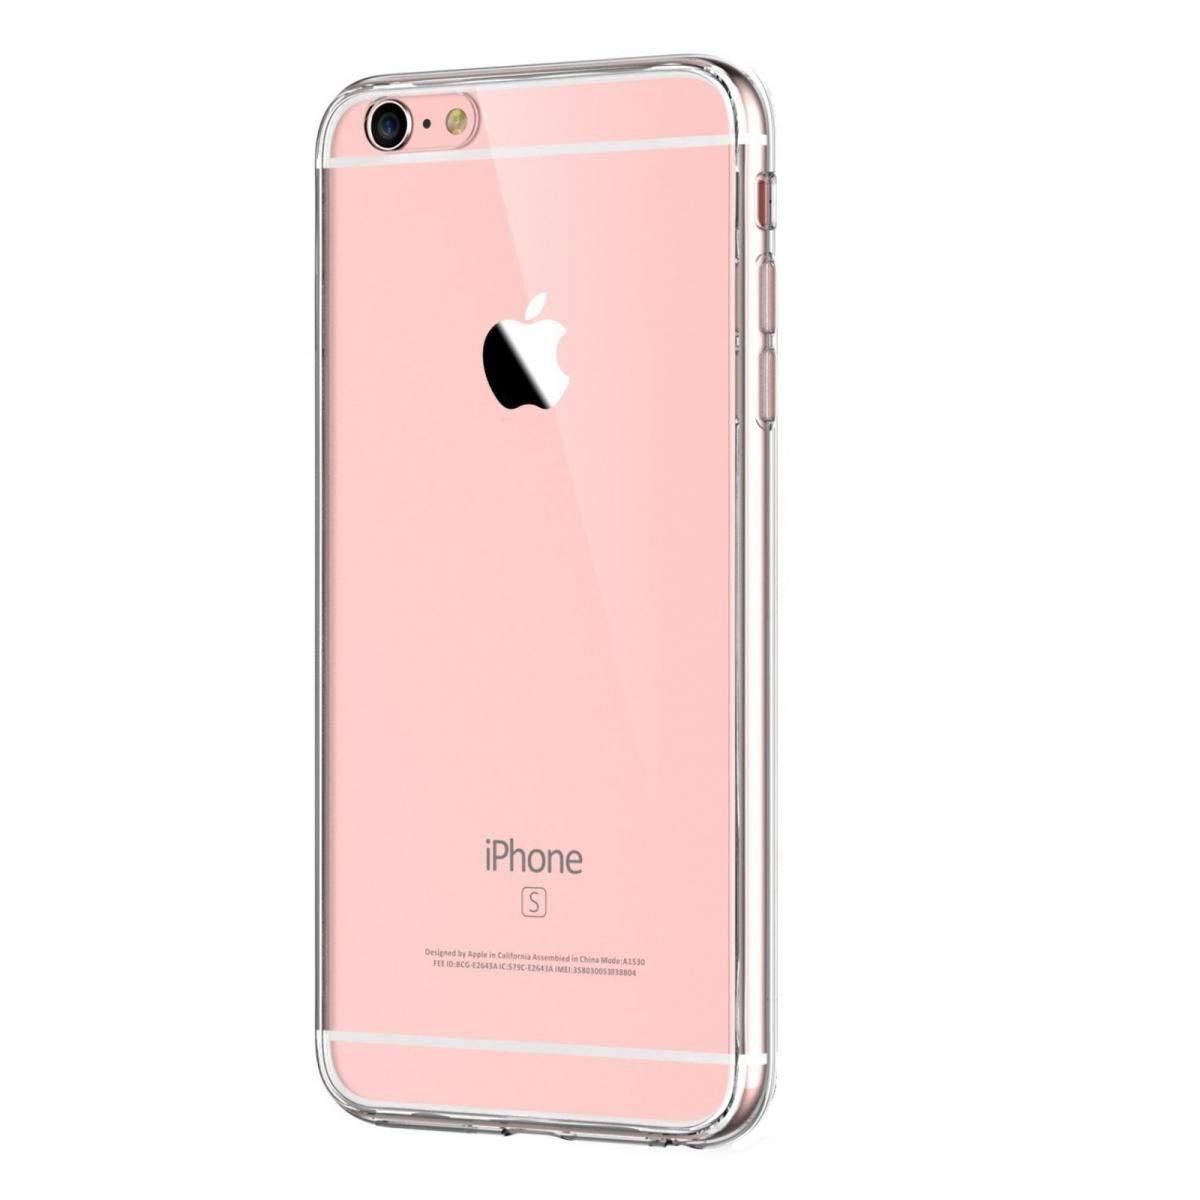 Comprar Funda Silicona para iPhone 6 / 6S Transparente con efecto